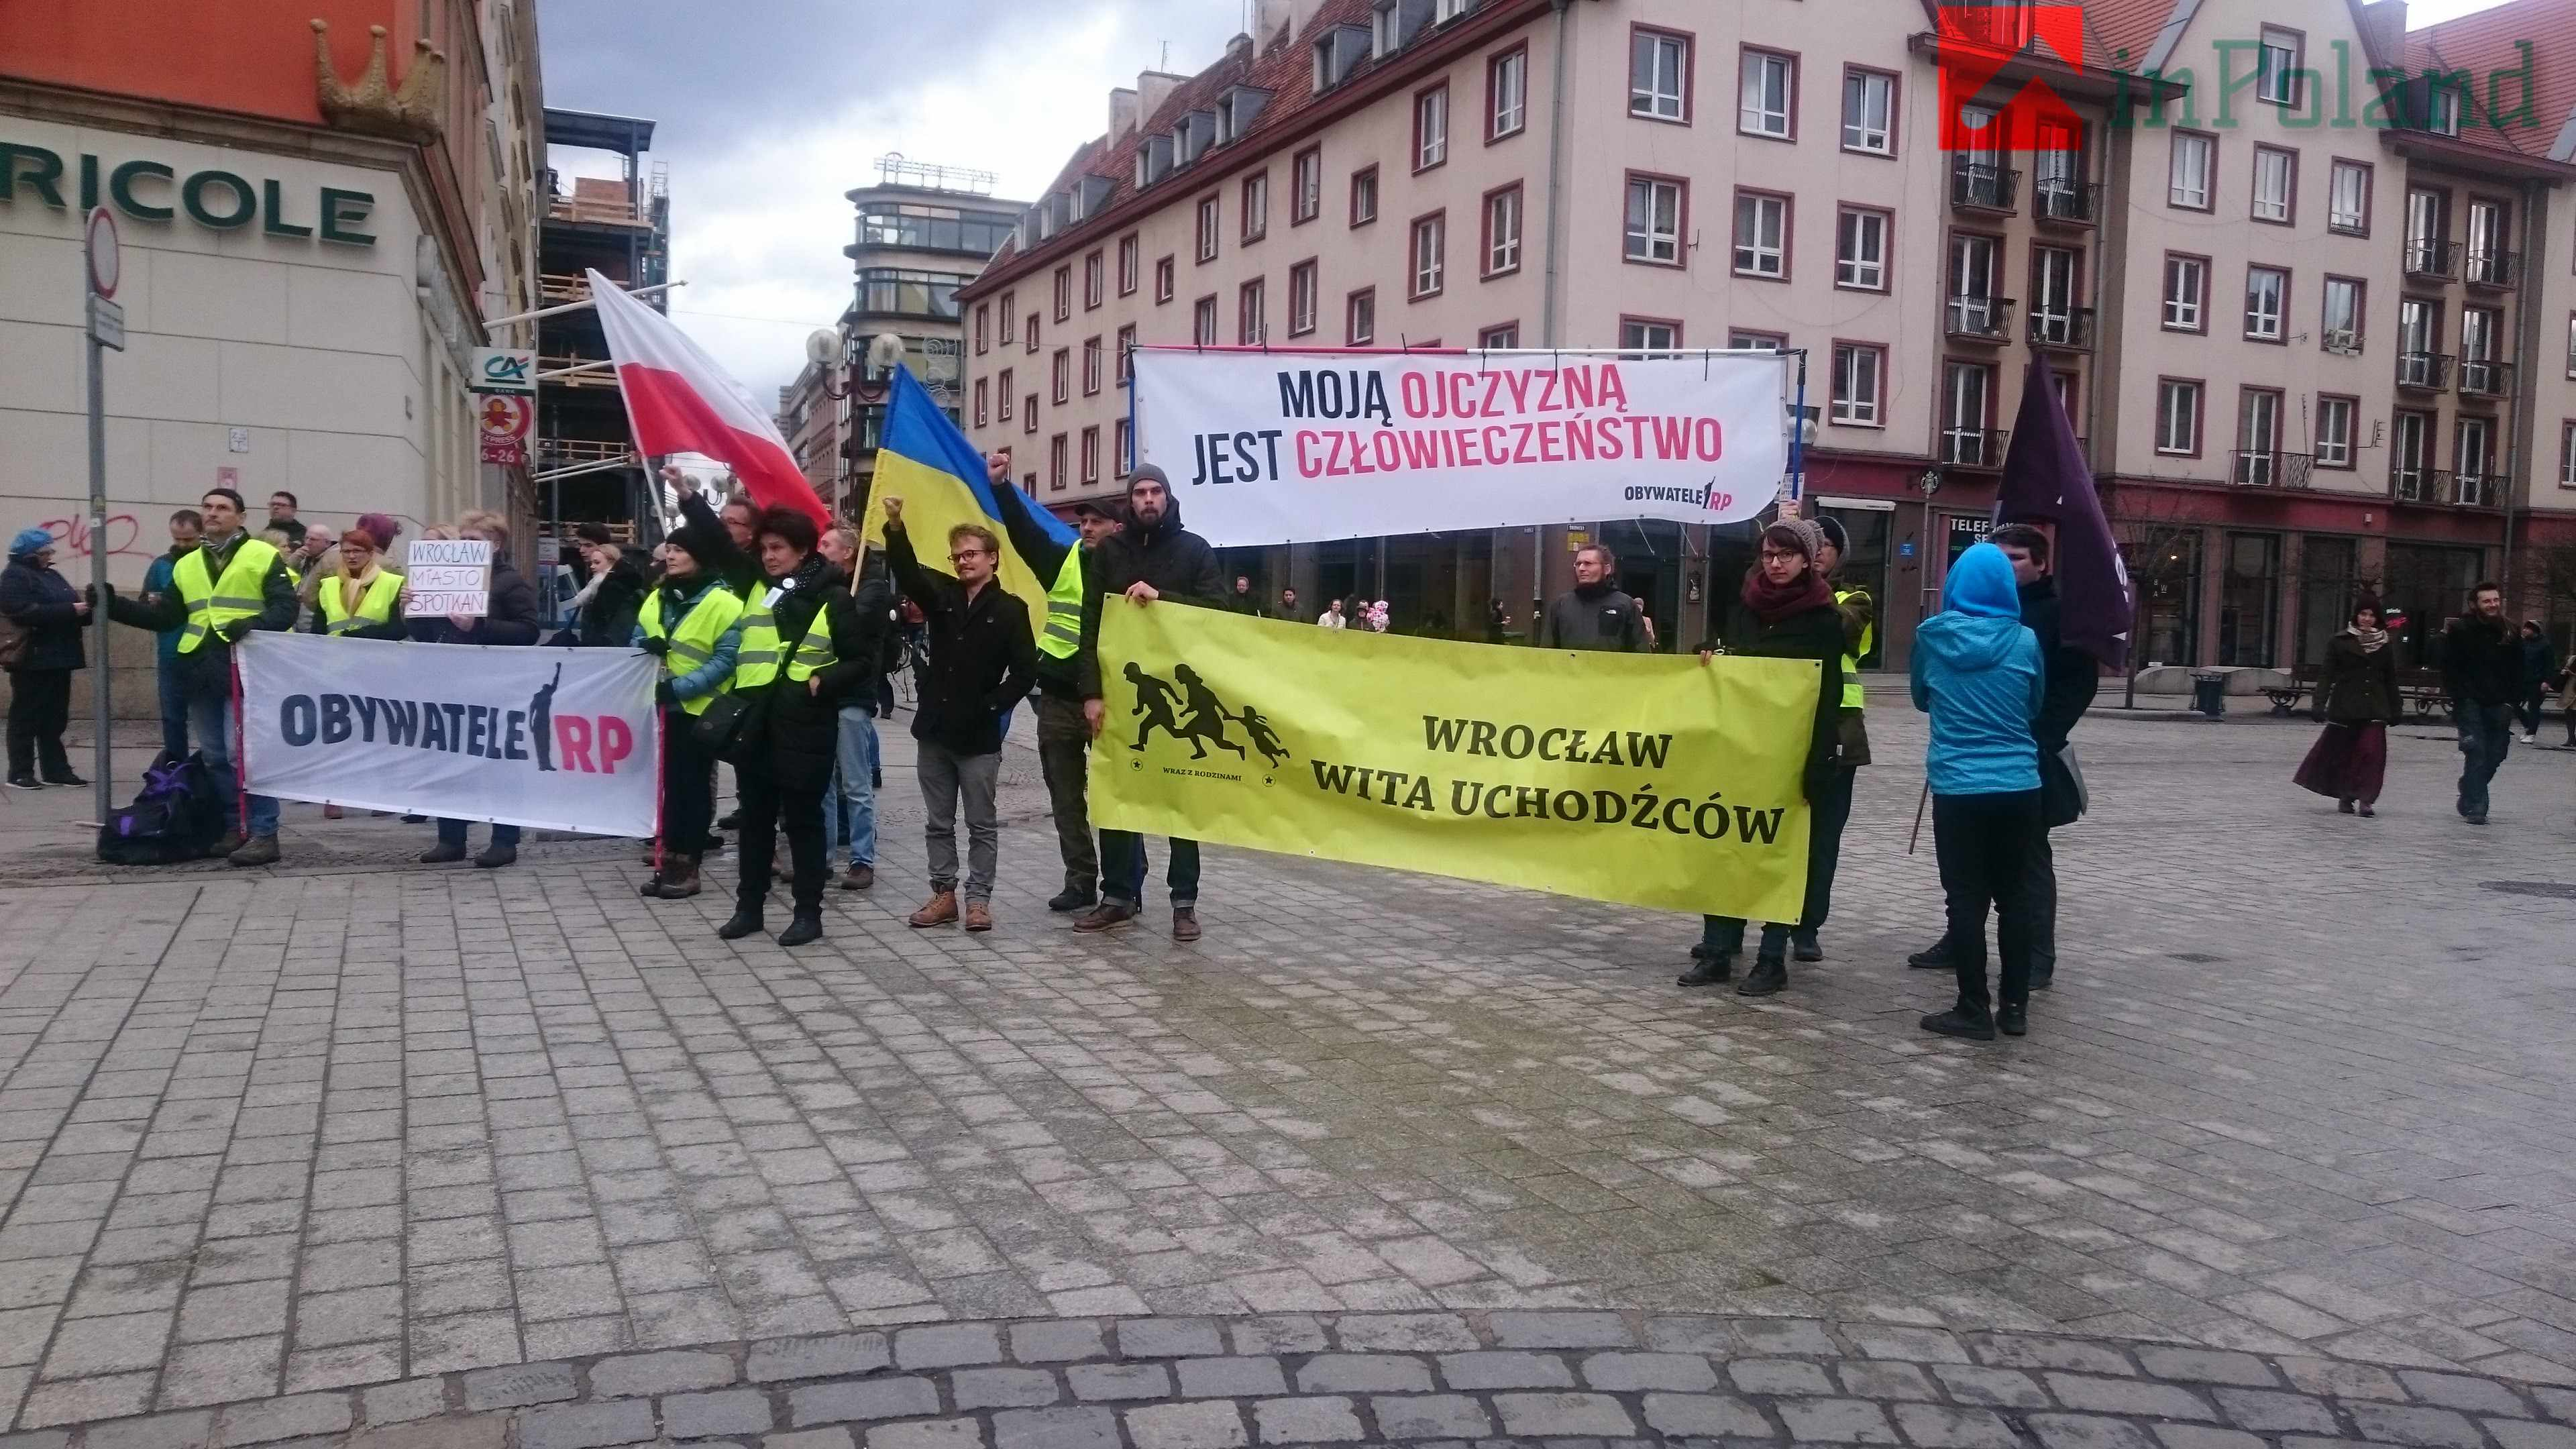 Митинг во Вроцлаве против Украины (ФОТО+ВИДЕО) (ОБНОВЛЕНО)